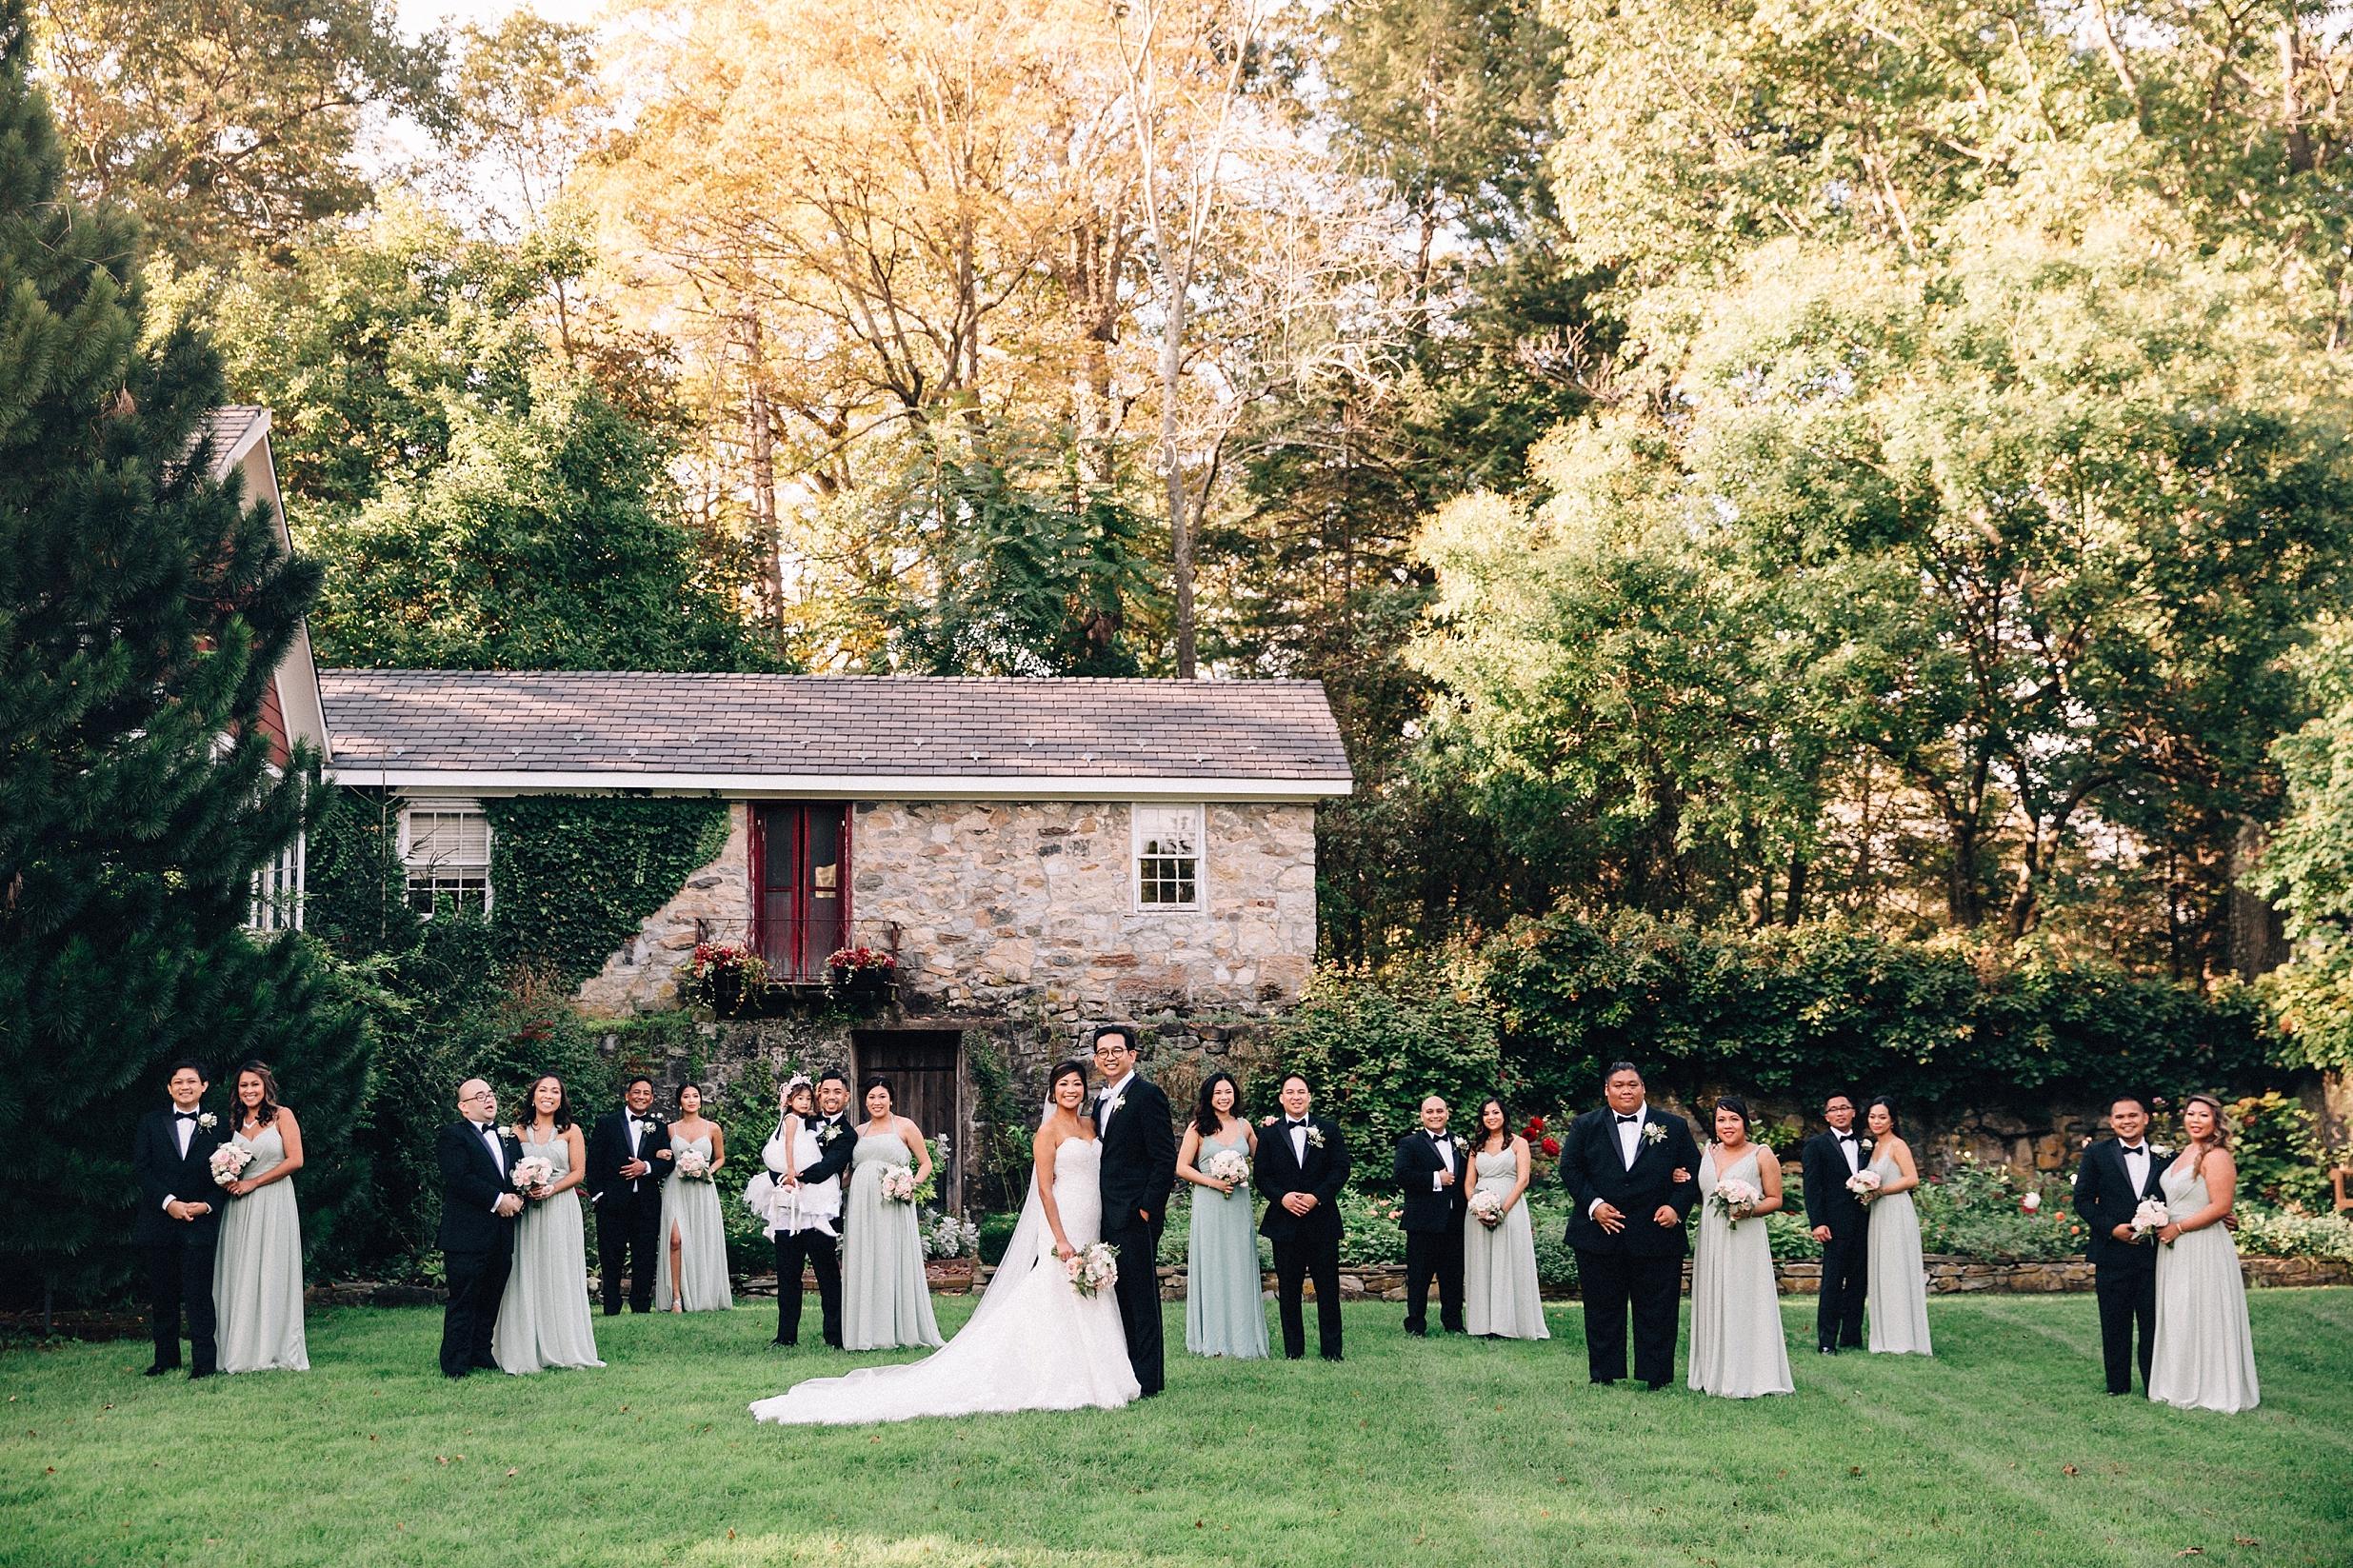 crossed-keys-estate-filipino-wedding-nj_0100.jpg